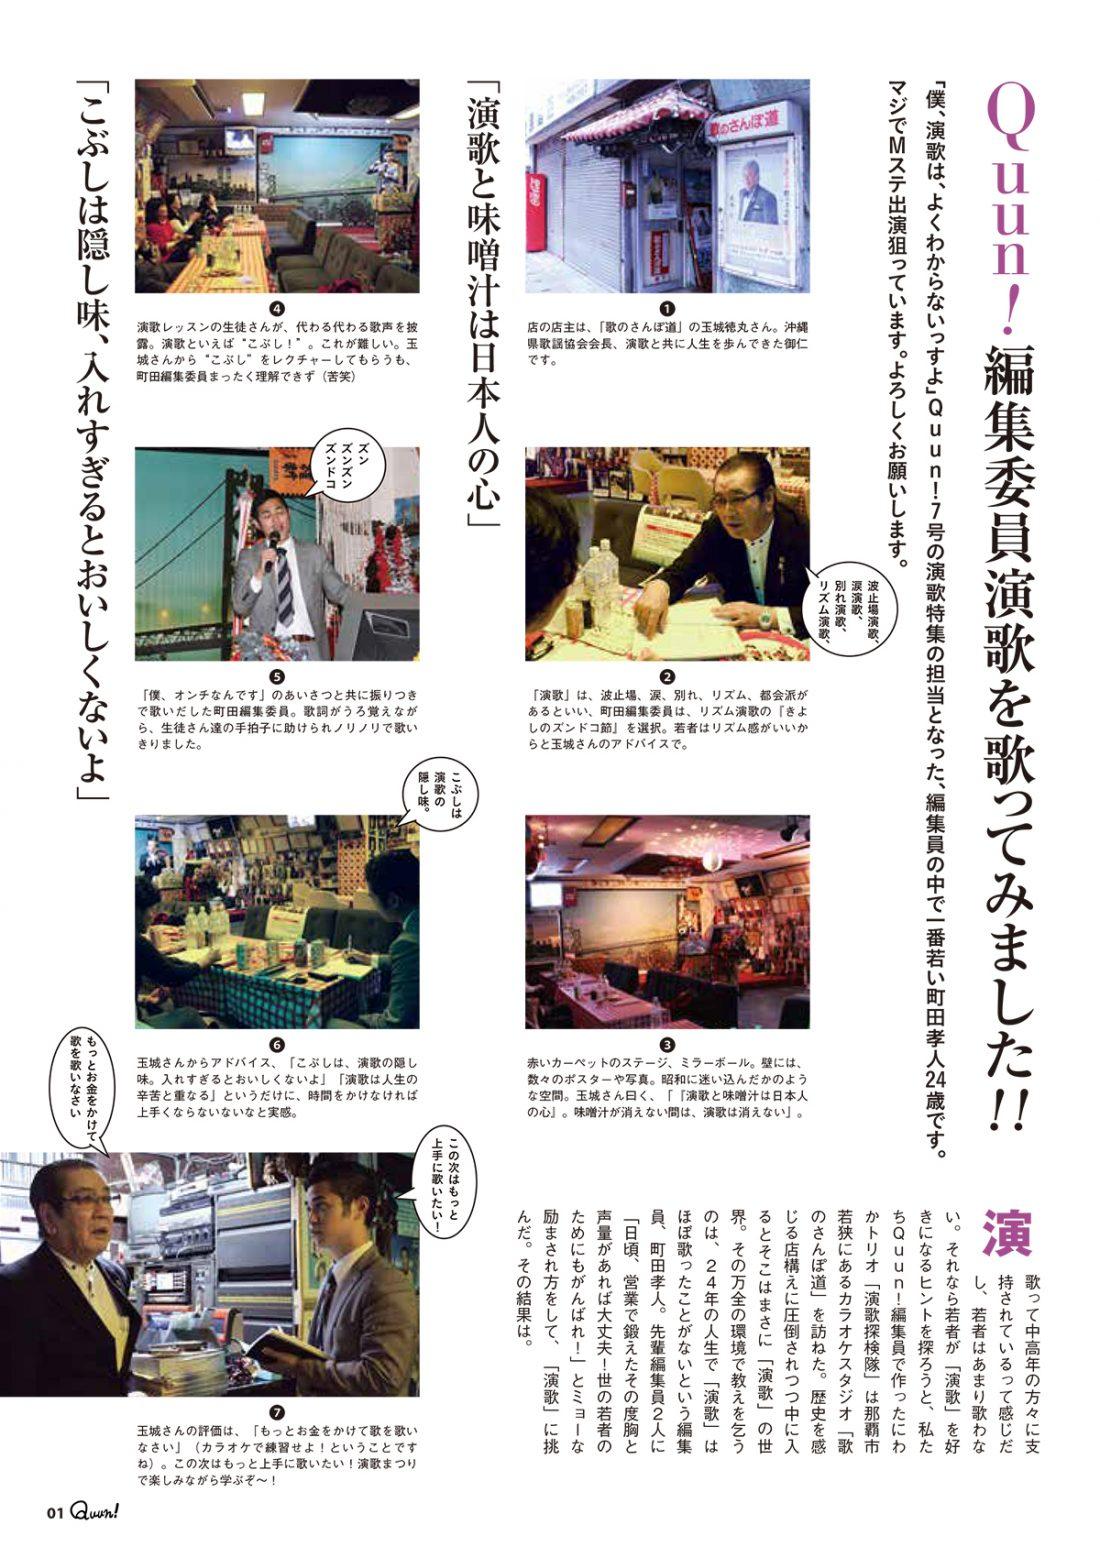 https://www.qab.co.jp/qgoro/wp-content/uploads/quun_0703-1100x1558.jpg